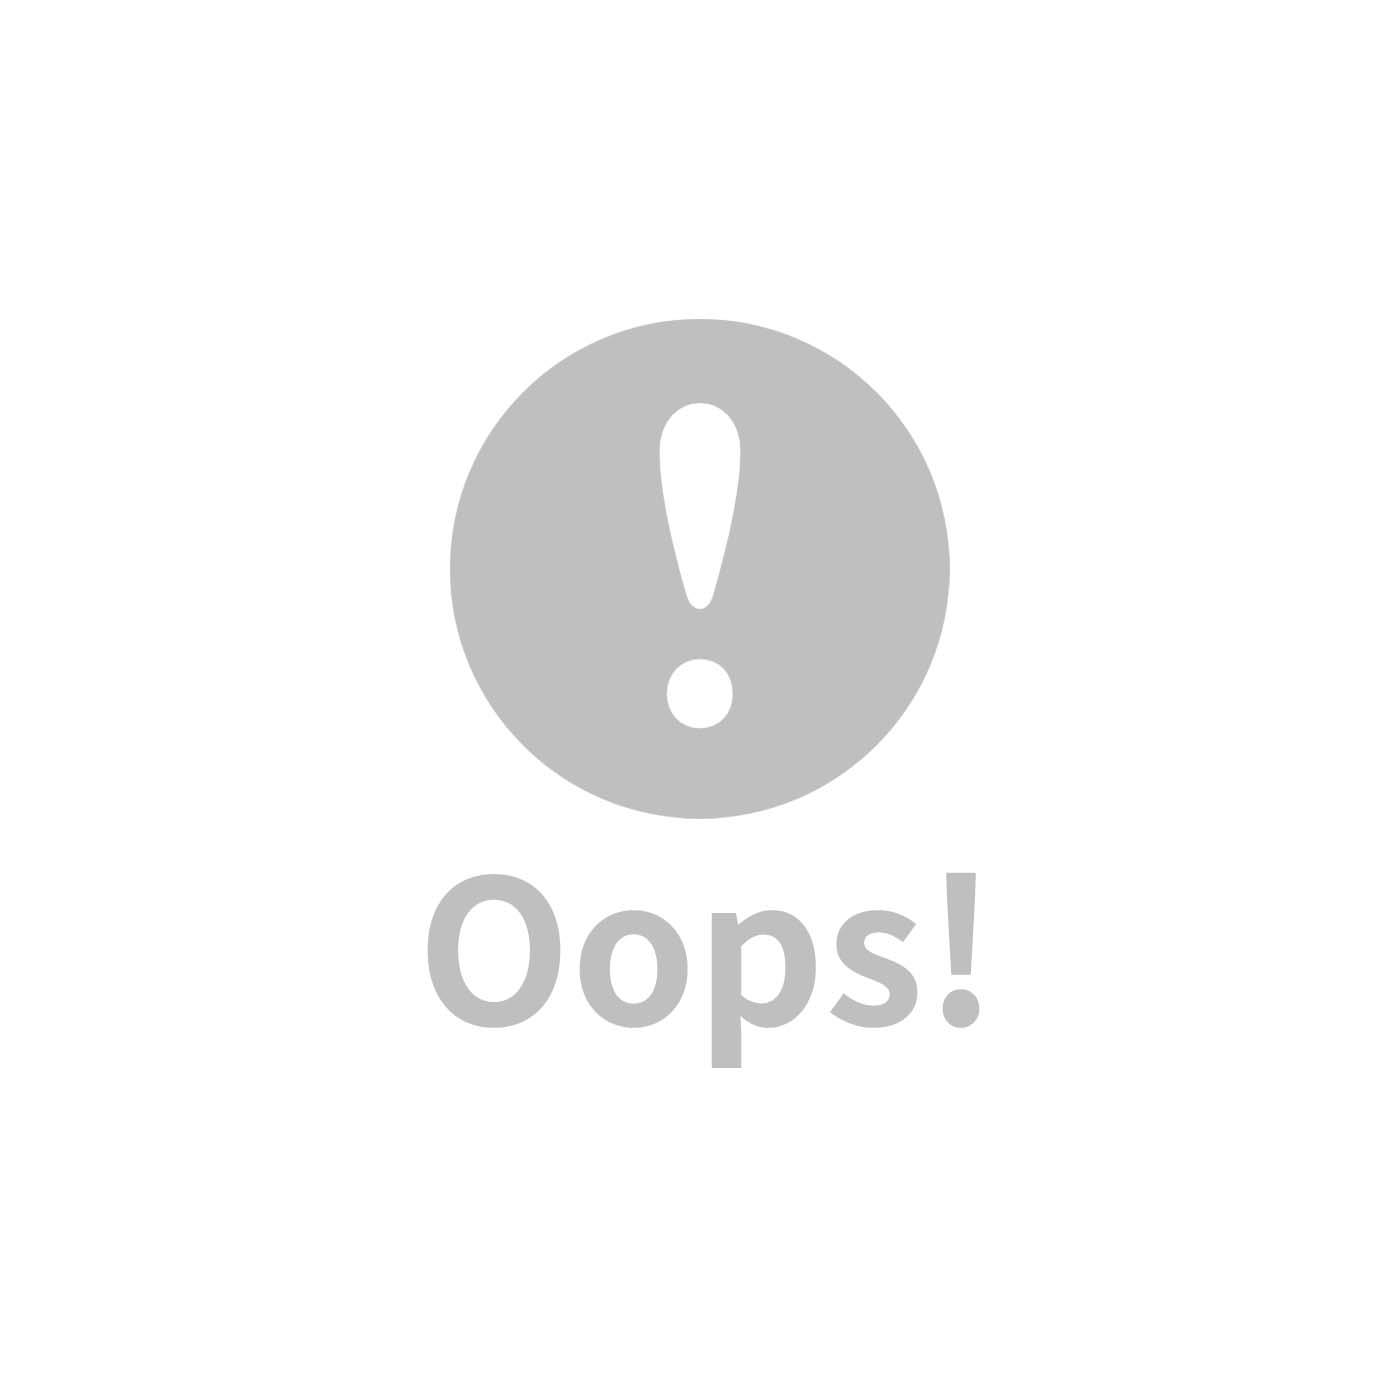 global affairs 童話手工編織安撫搖鈴_飛機系列(海洋綠)